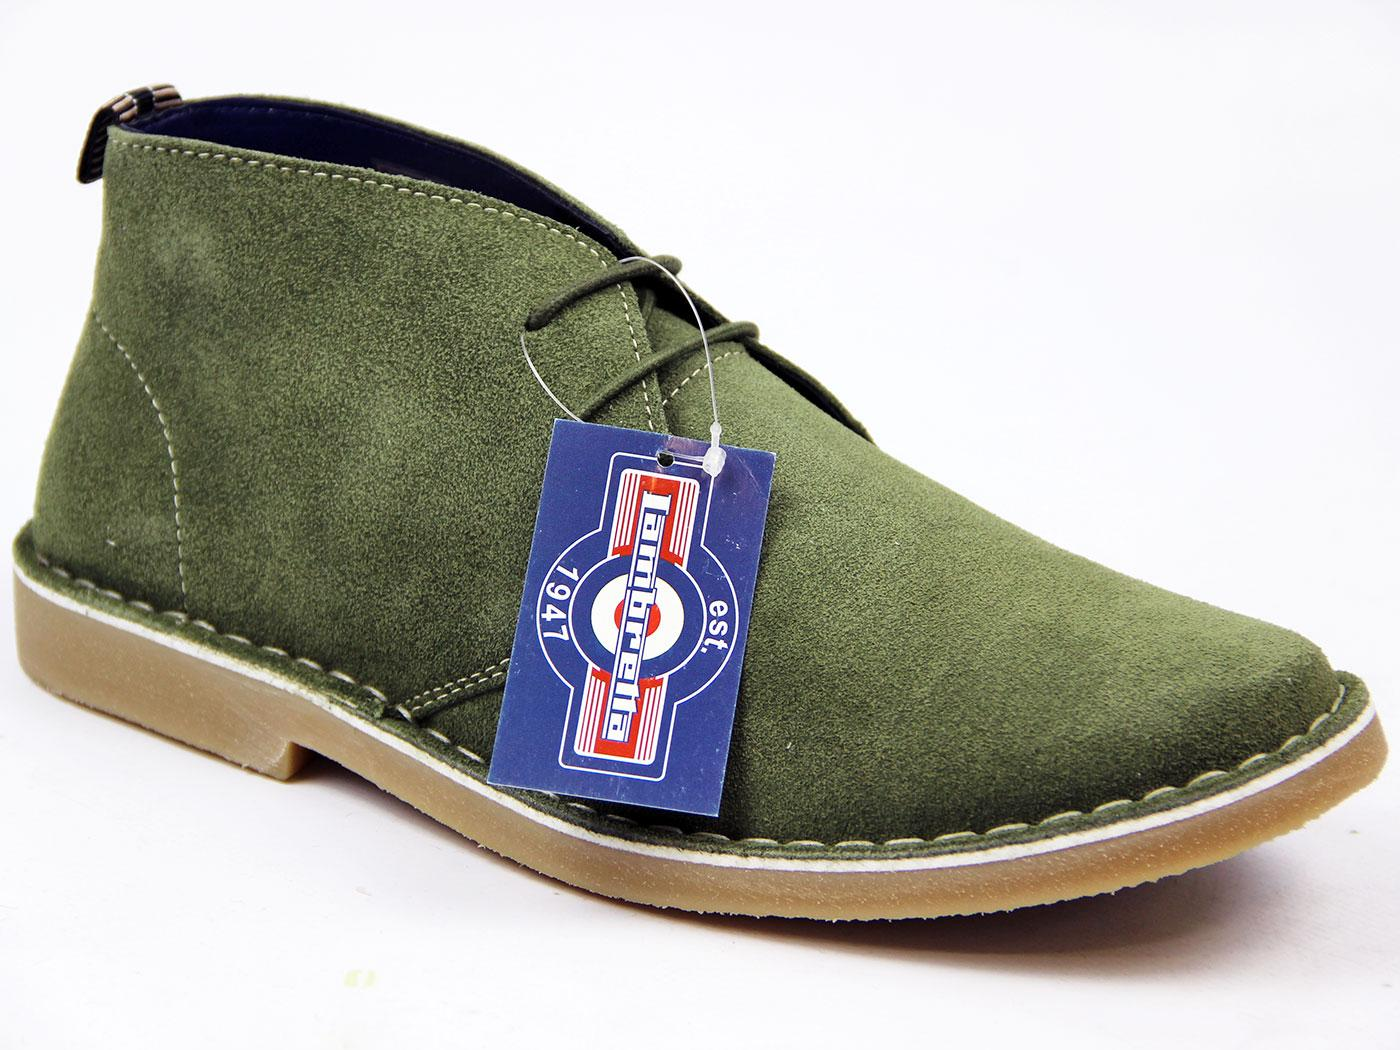 Retro 60s Mod Suede Desert Boots Olive